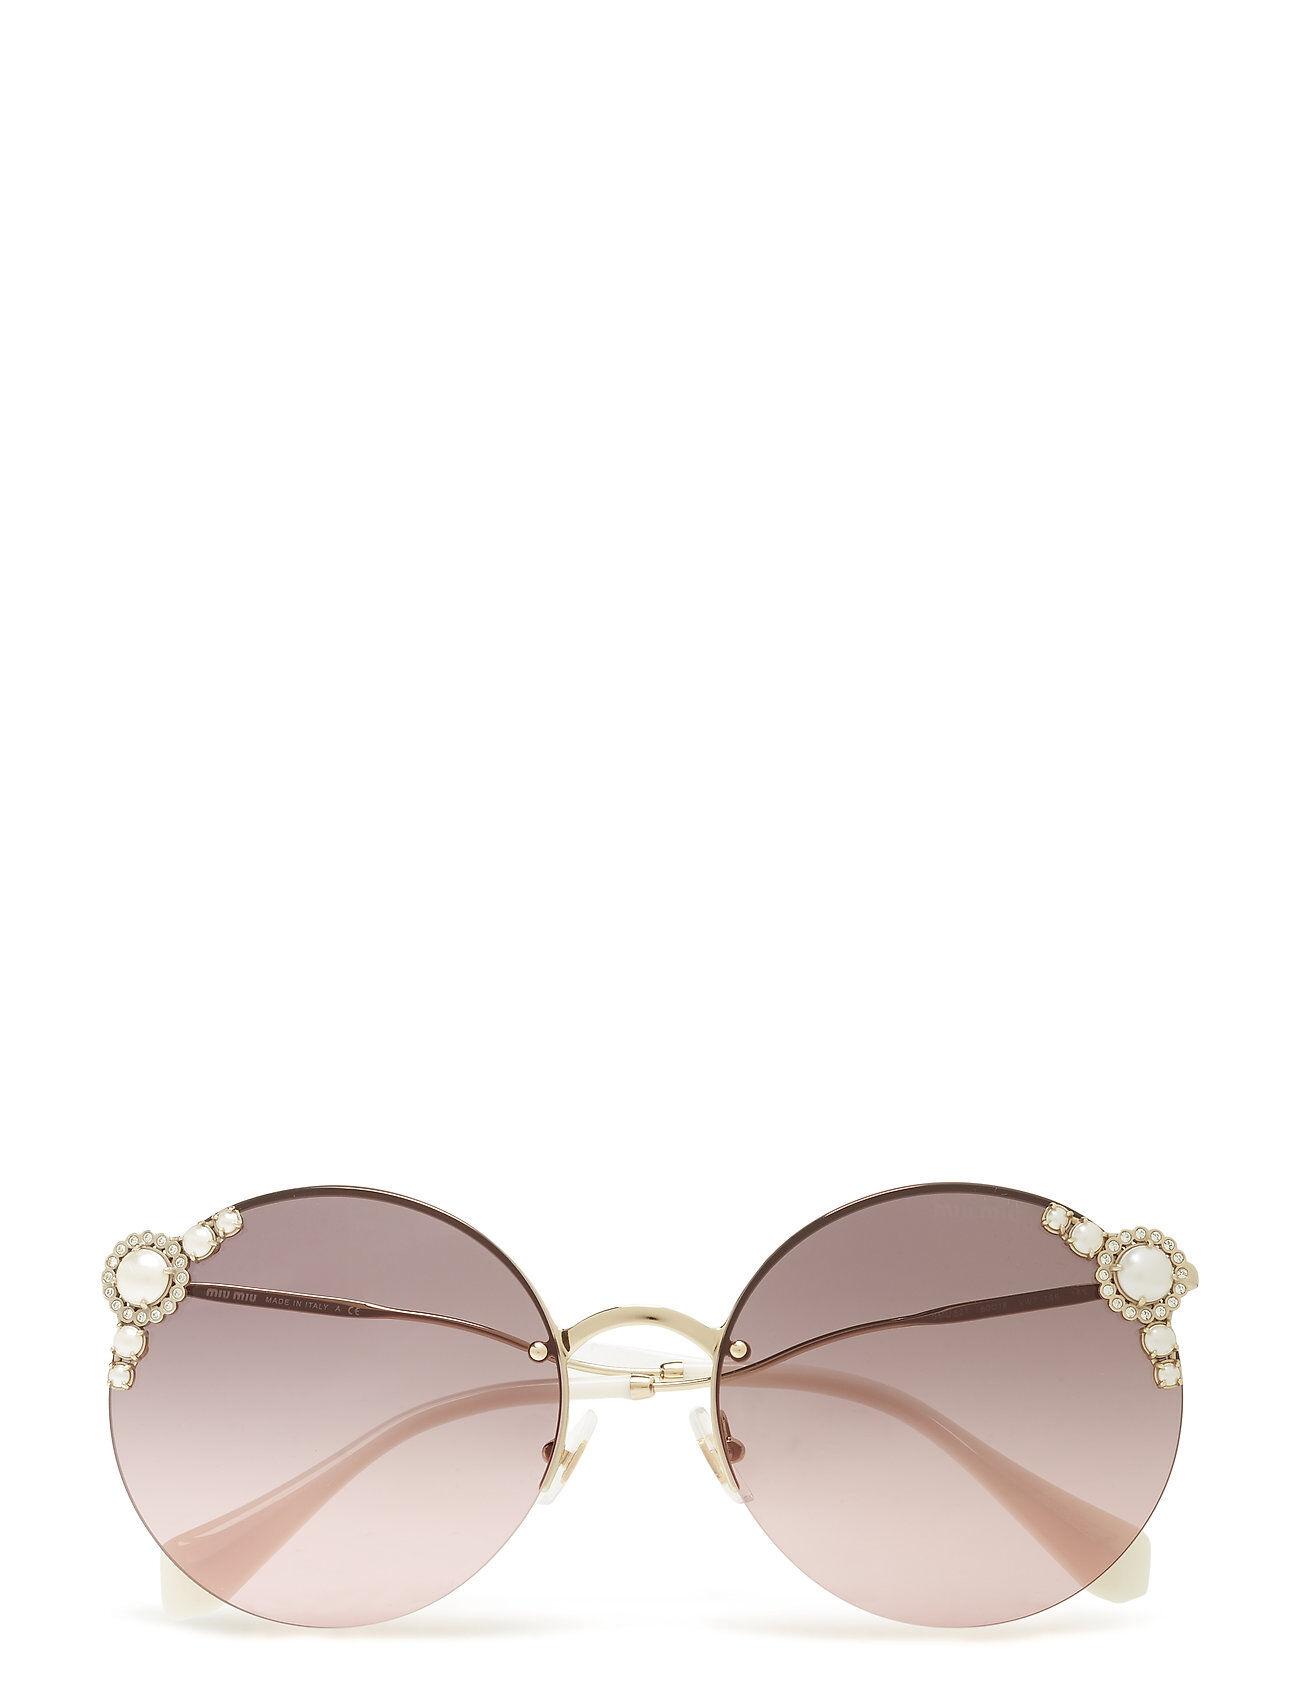 Miu Miu Sunglasses 0mu 52ts